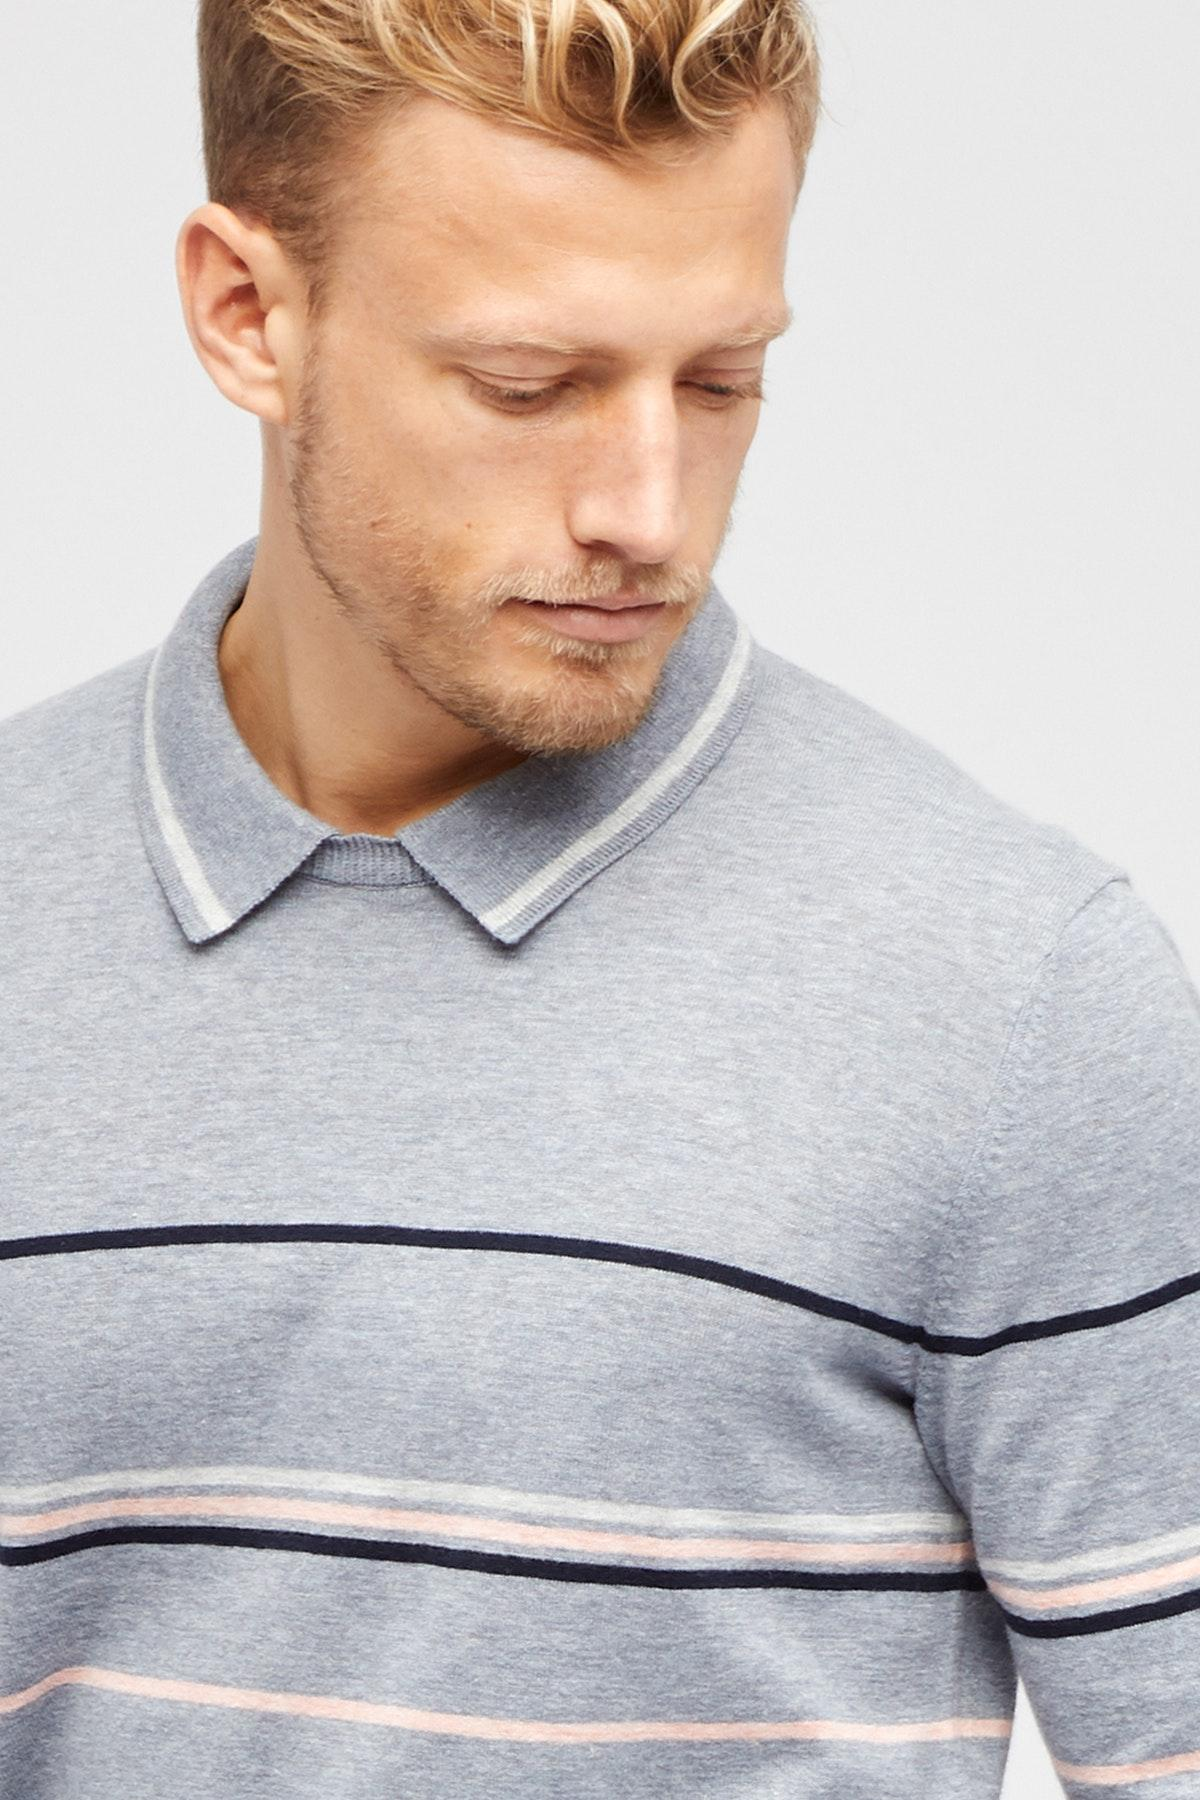 b782abece5b3 Lyst - Bonobos Cotton Linen Collar Crew Neck Sweater in Gray for Men